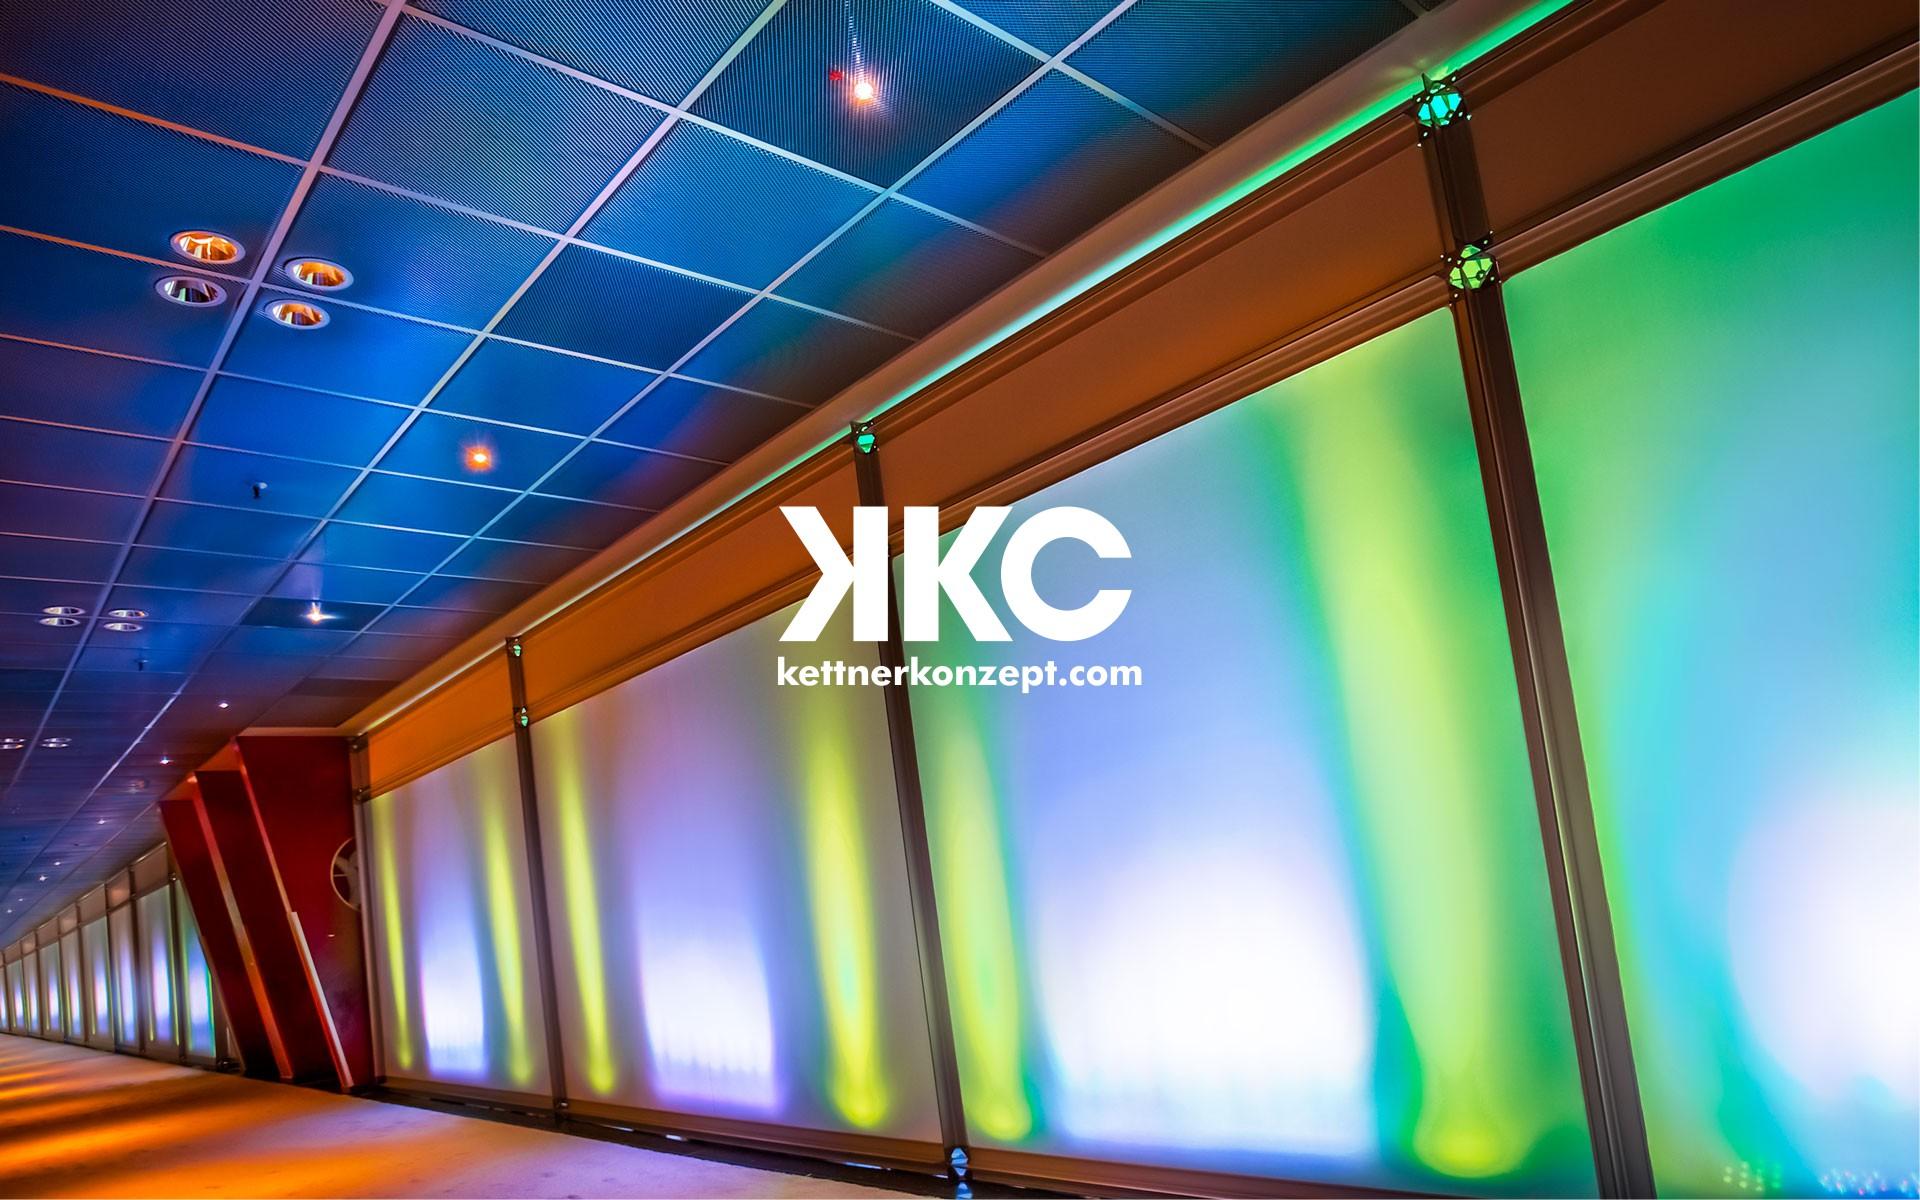 O-ZEN Portfolio Kettner Konzept Innendesign Veranstaltung LED Beleuchtete Wand